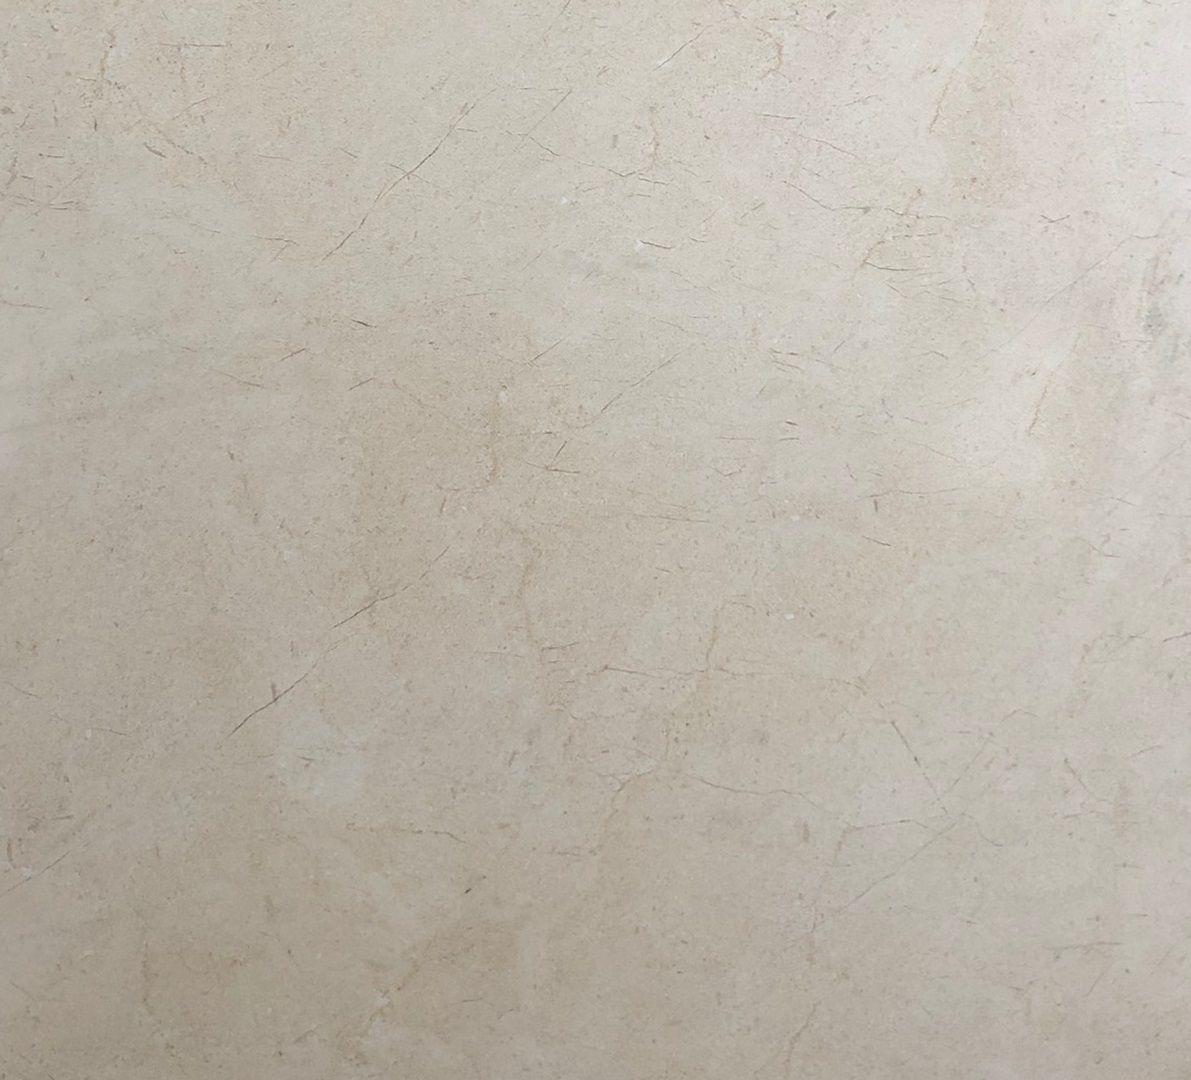 vloertegel 3060 cm marmerlook beige